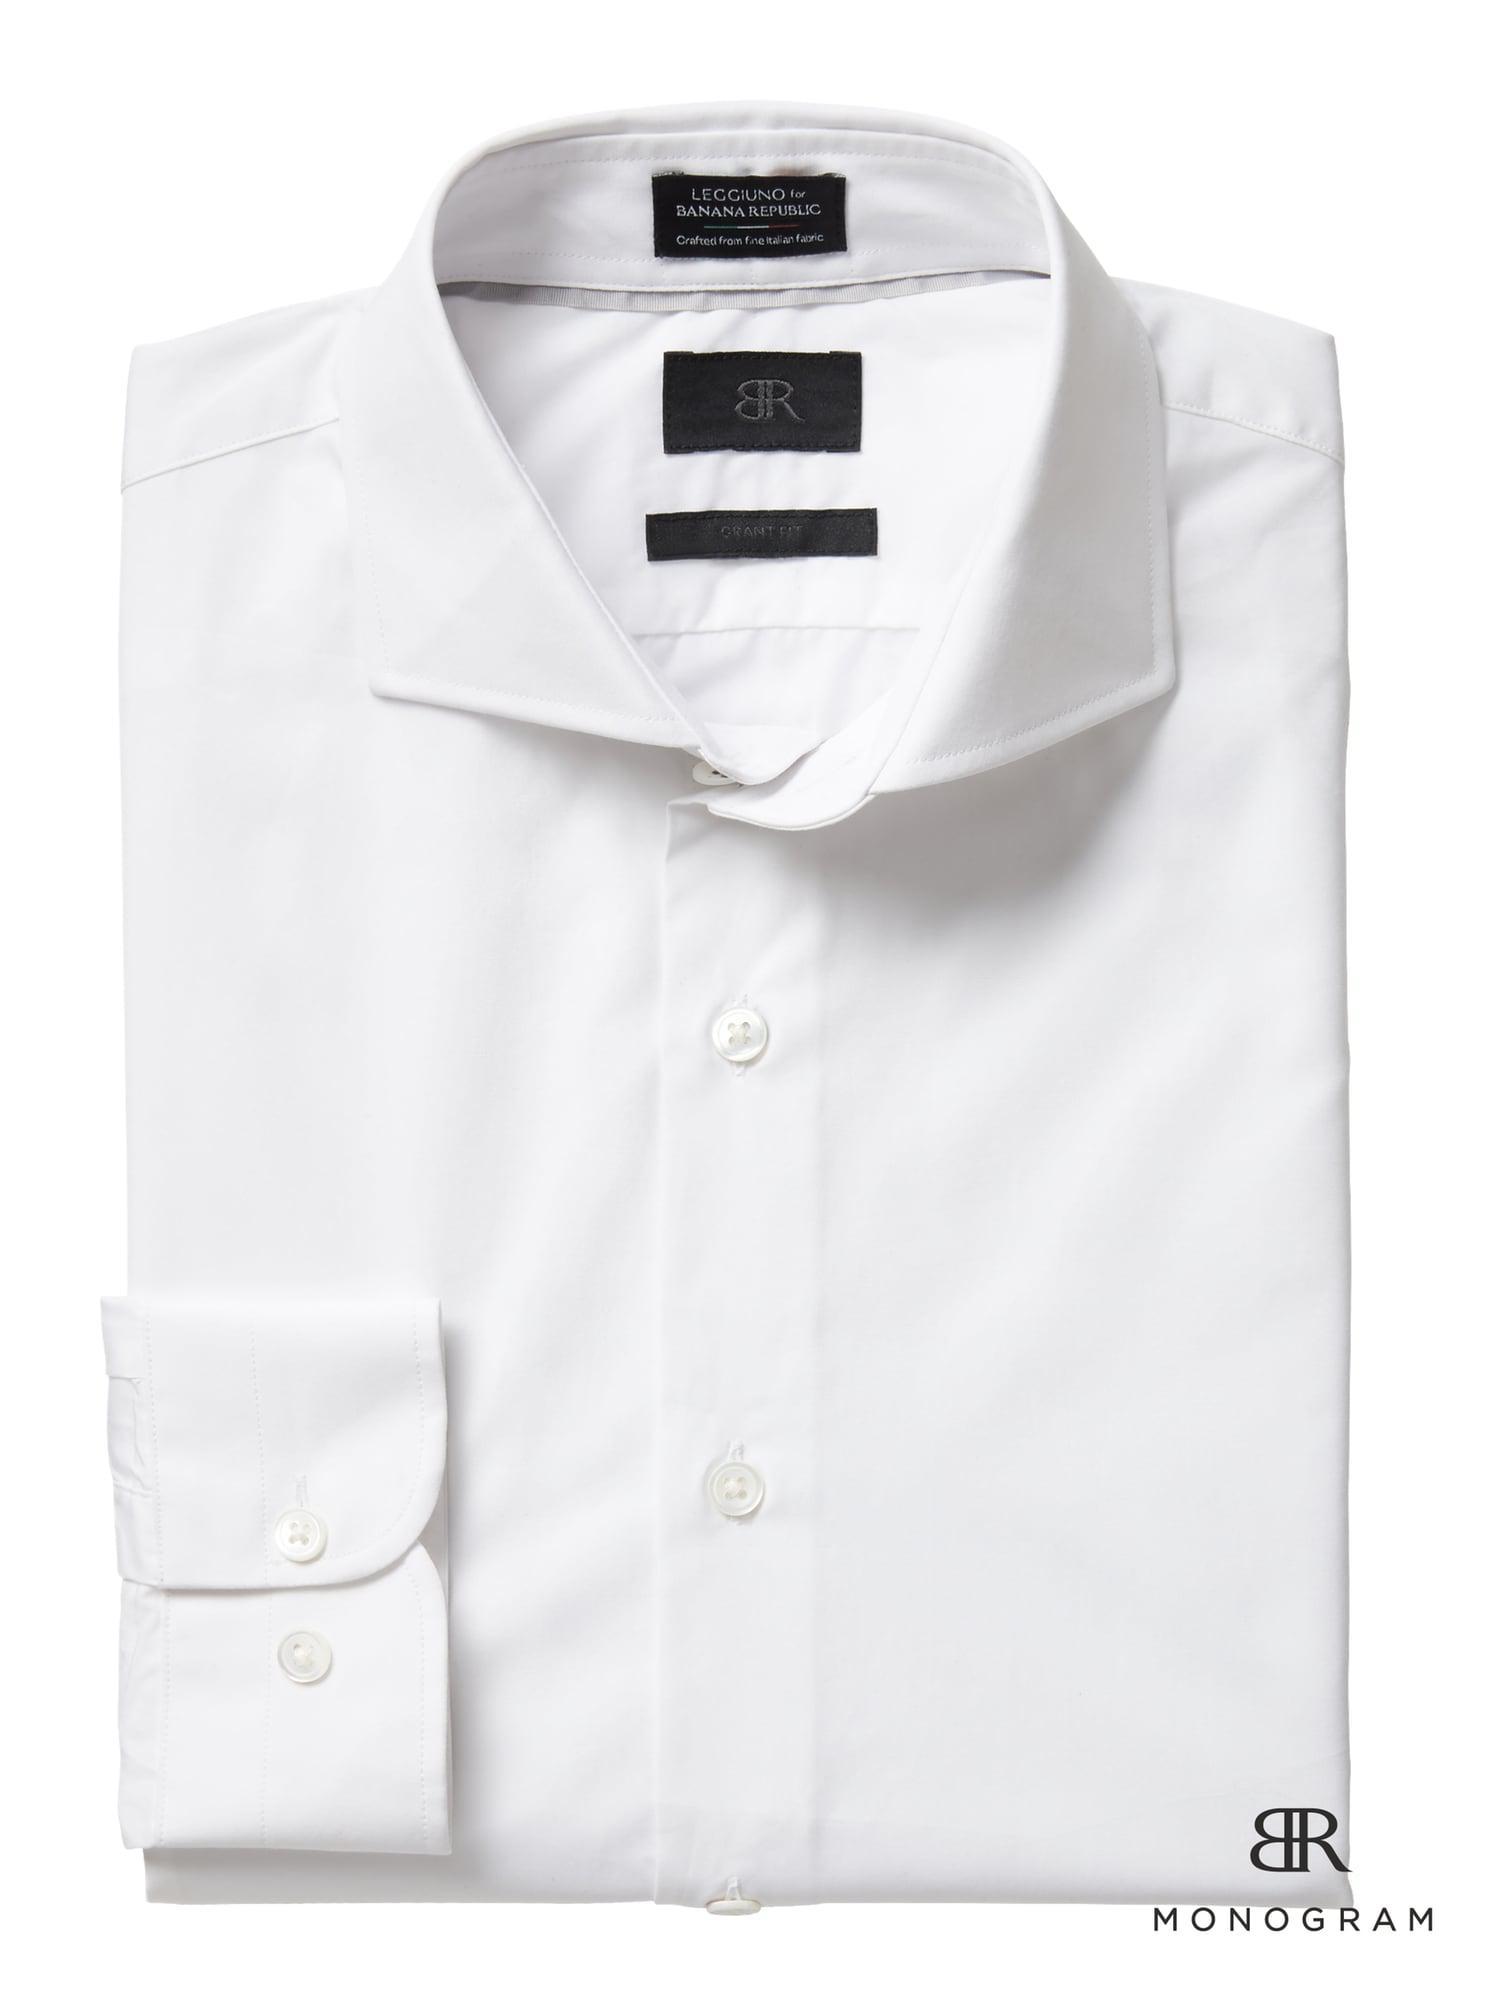 1606afb7 Banana Republic. Men's White Monogram Grant Slim-fit Italian Cotton Dress  Shirt